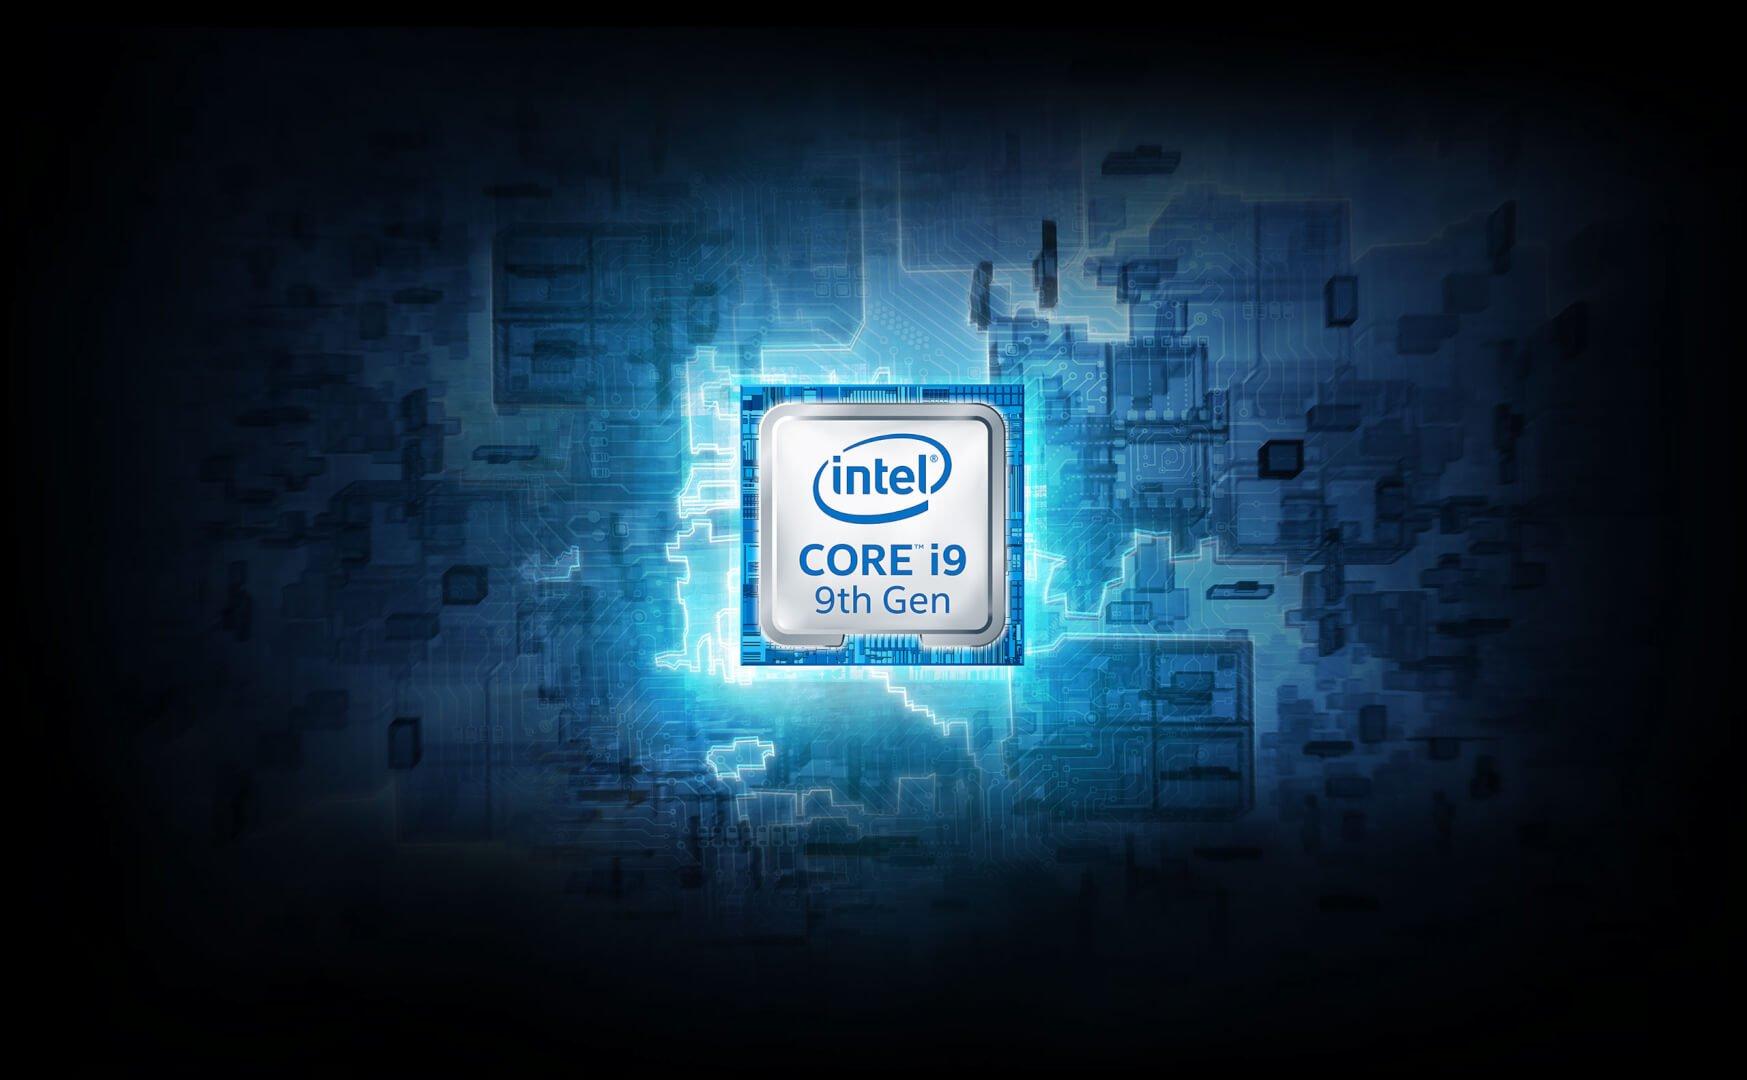 Amd Ryzen 9 3900x Vs Intel Core I9 9900k Which High End Cpu Should You Buy Hardware Times